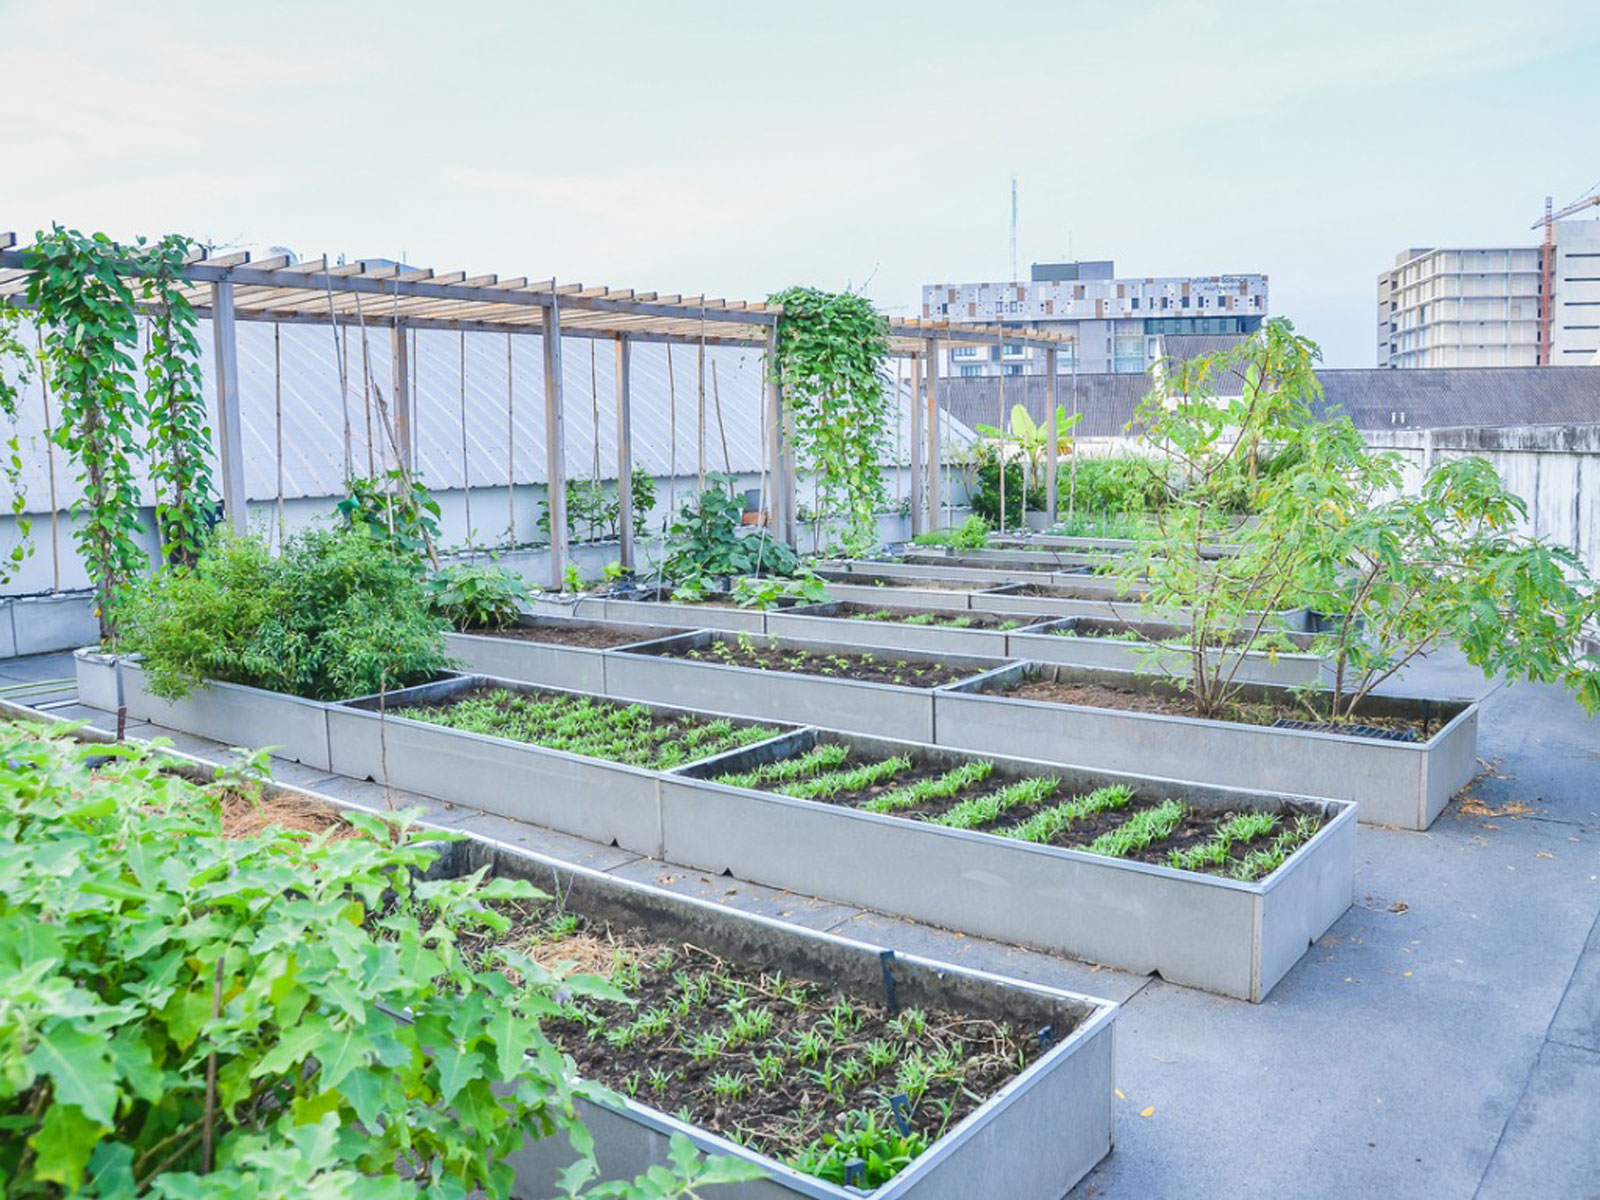 Roof Garden Design - How To Build A Rooftop Garden